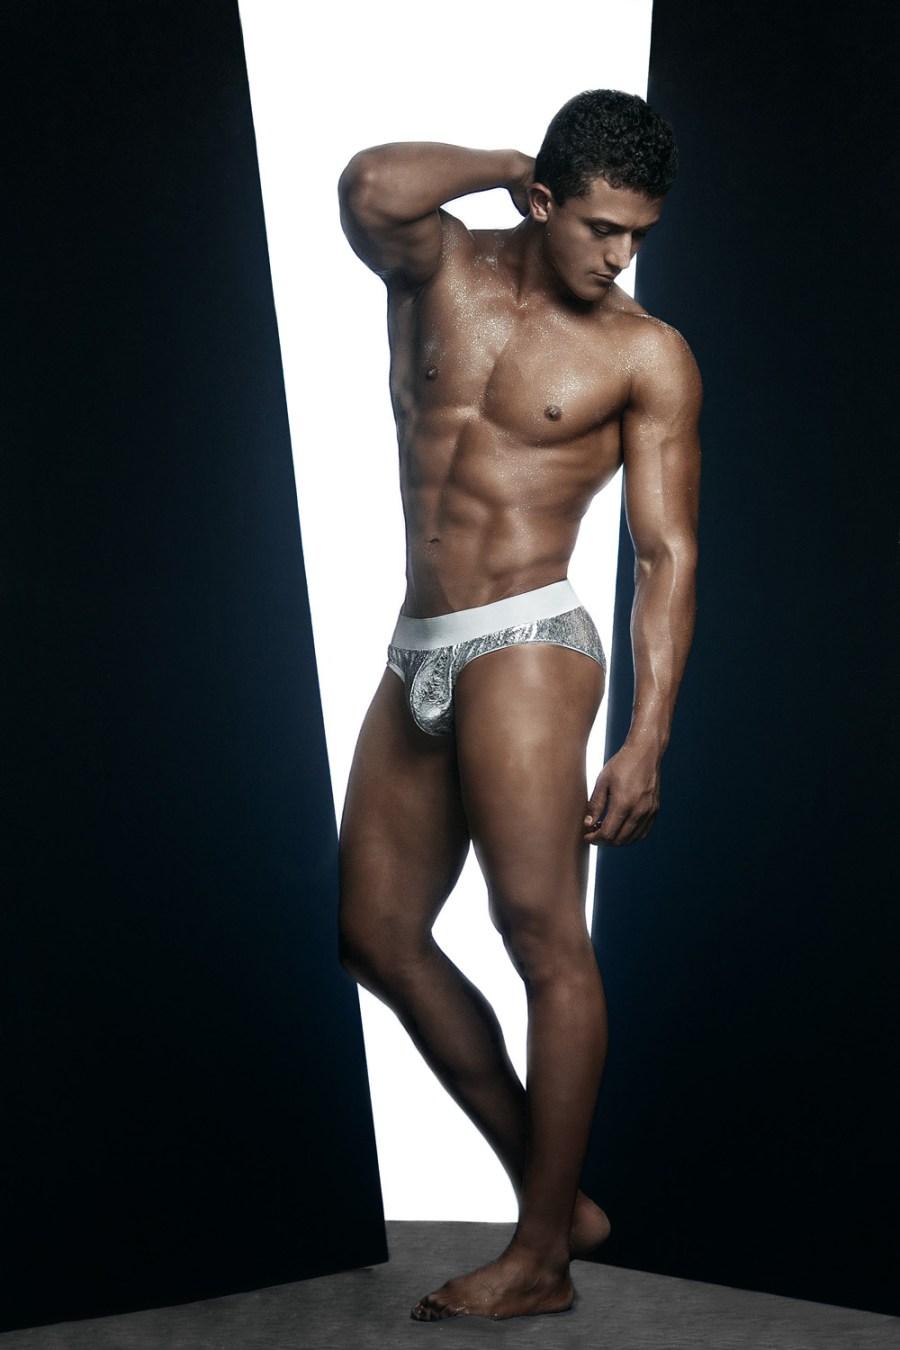 Erik Ramos by Chris Femat for Fashionably Male416